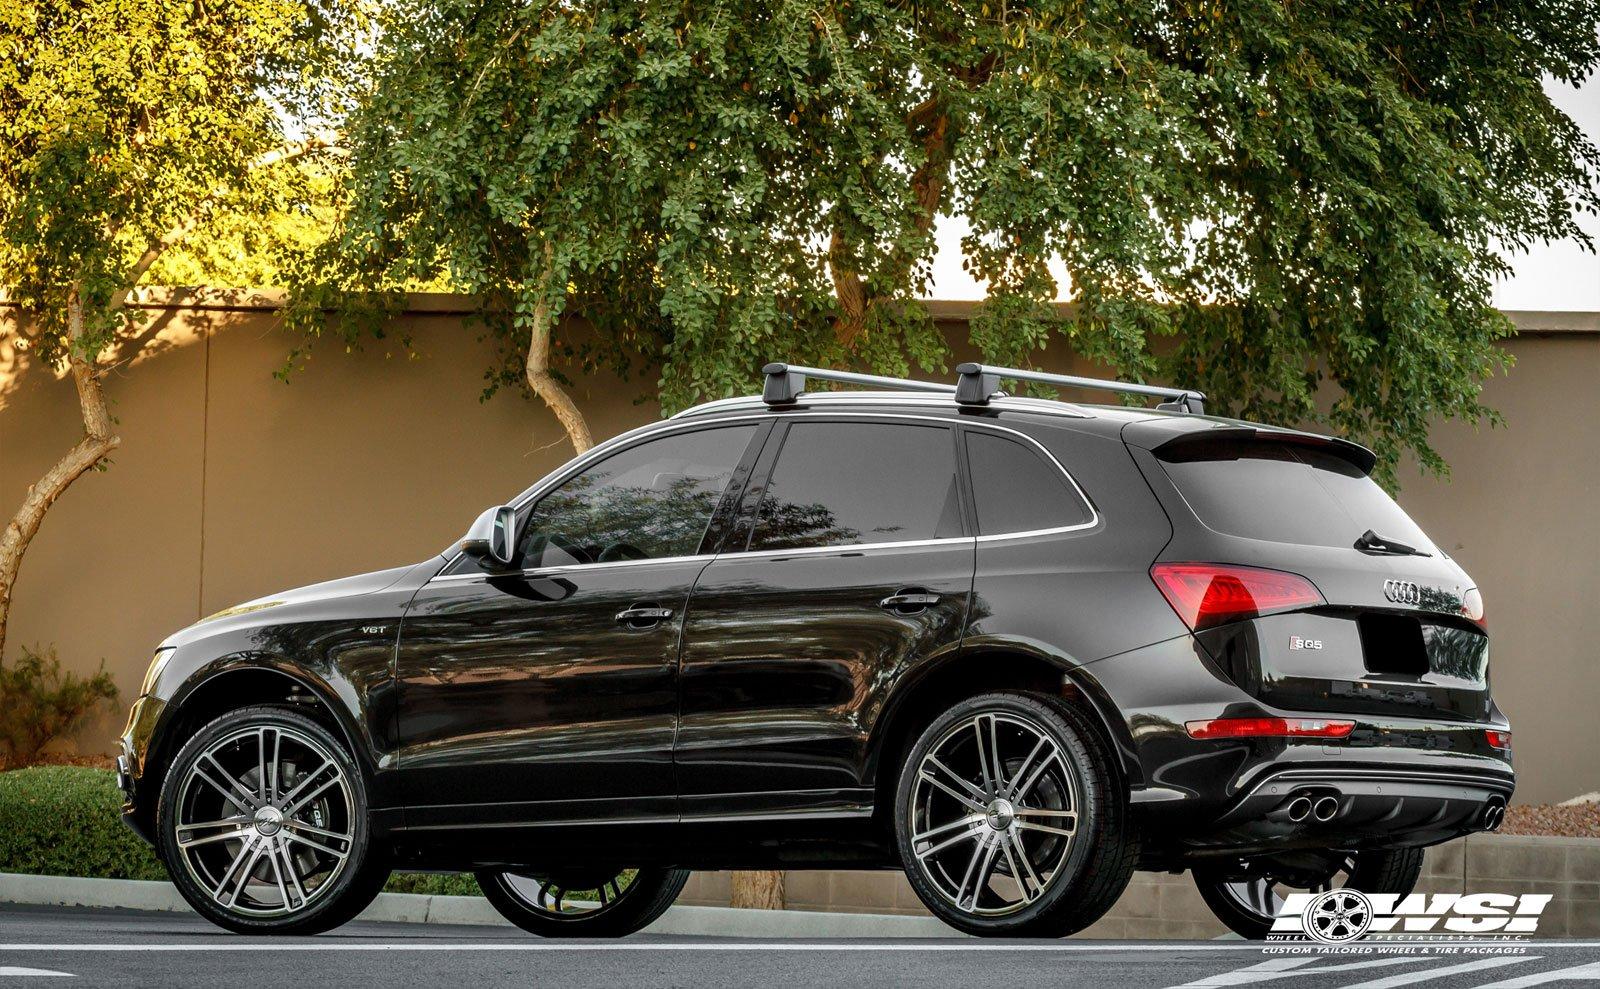 2015 Cars Cec Tuning Wheels Audi Sq5 Suv Wallpaper